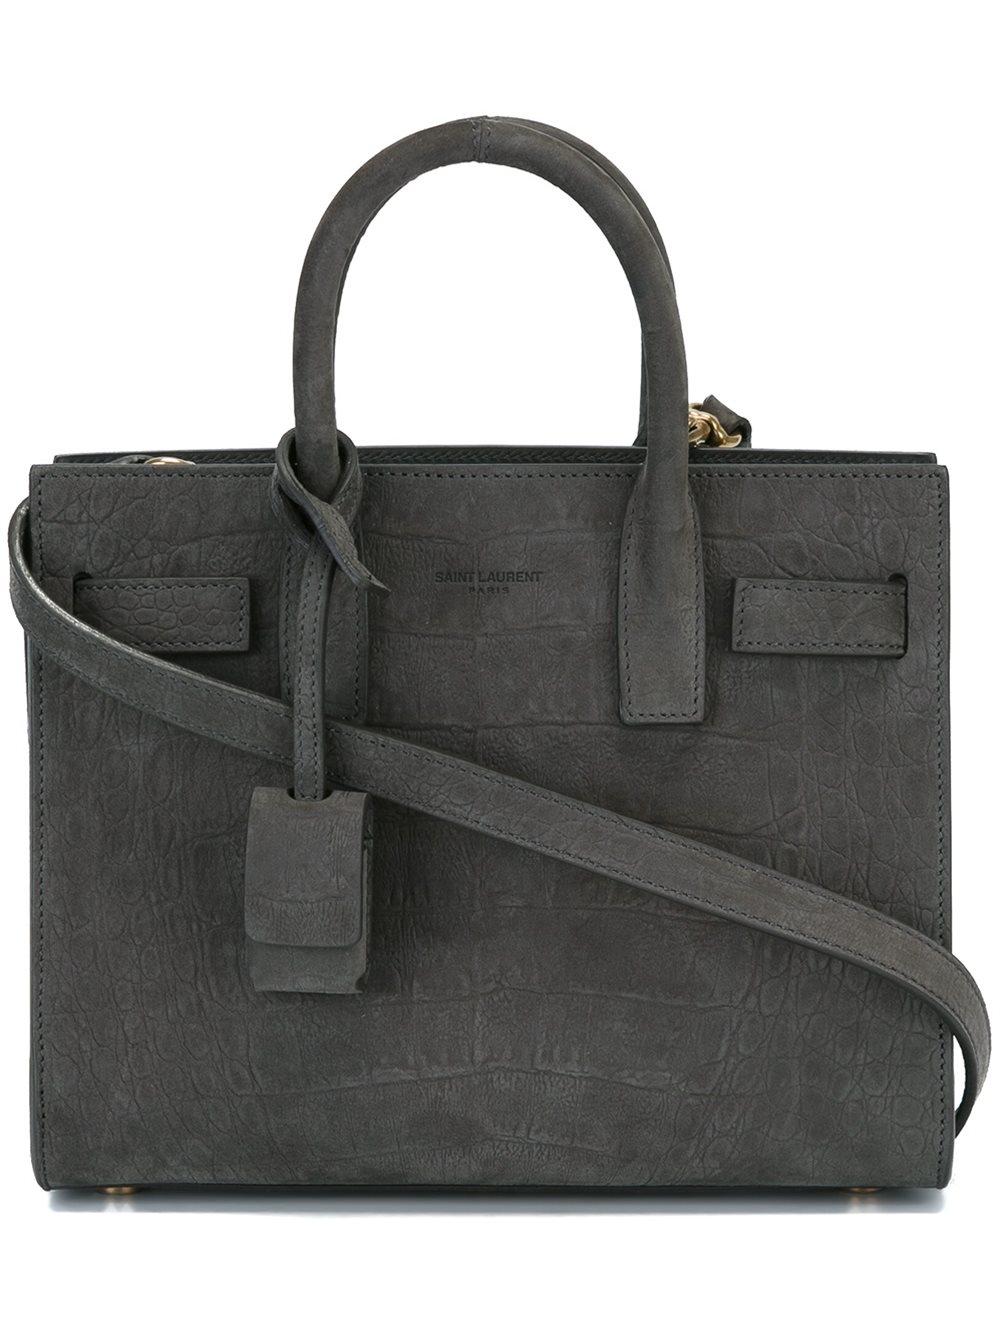 saint laurent nano 39 sac de jour 39 tote bag in grey grey lyst. Black Bedroom Furniture Sets. Home Design Ideas